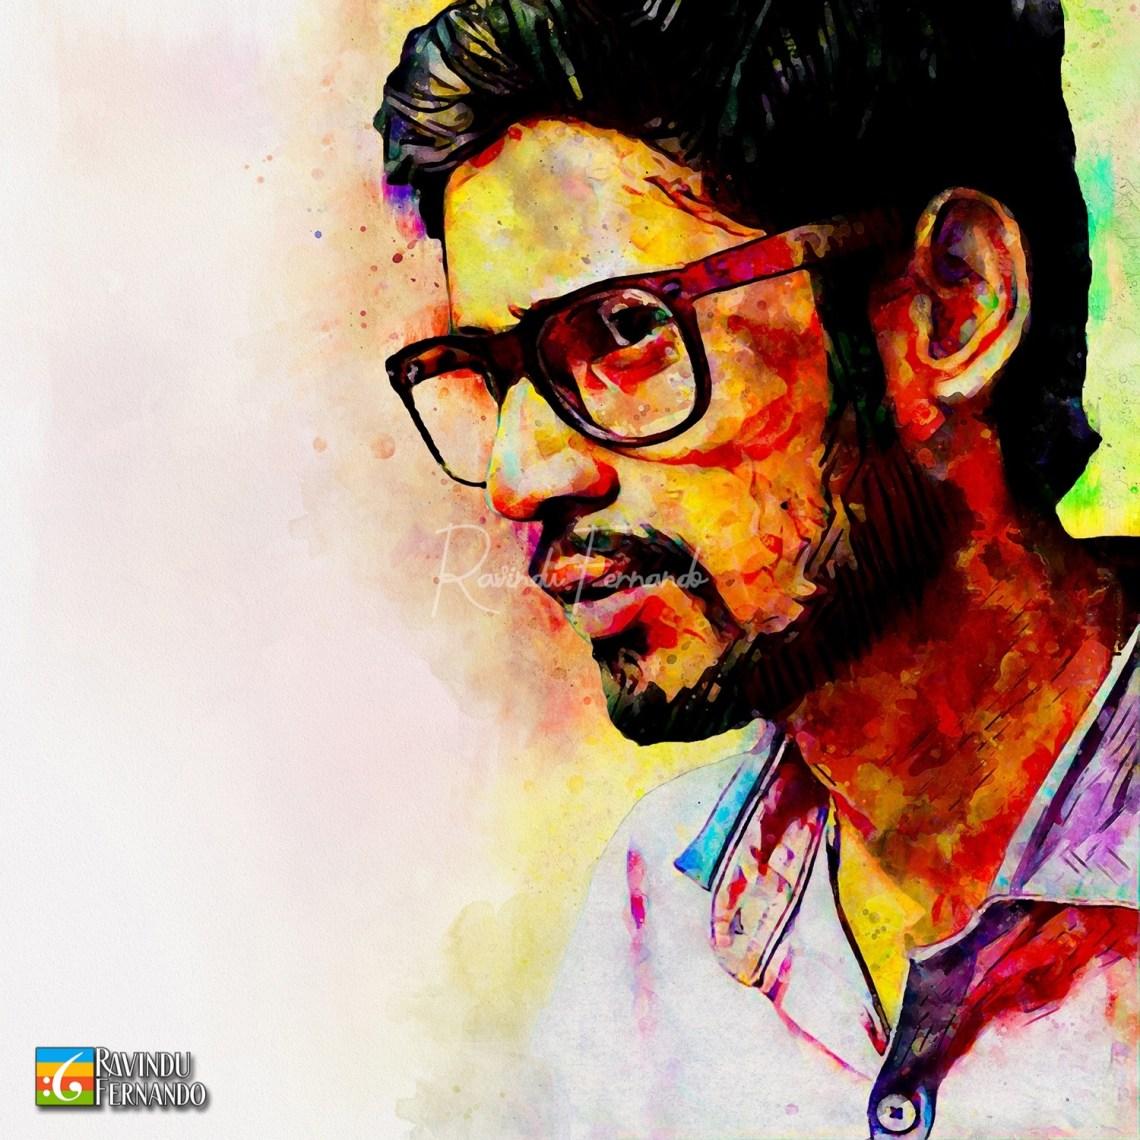 Vimukthi Dushantha - Digital Watercolor Painting